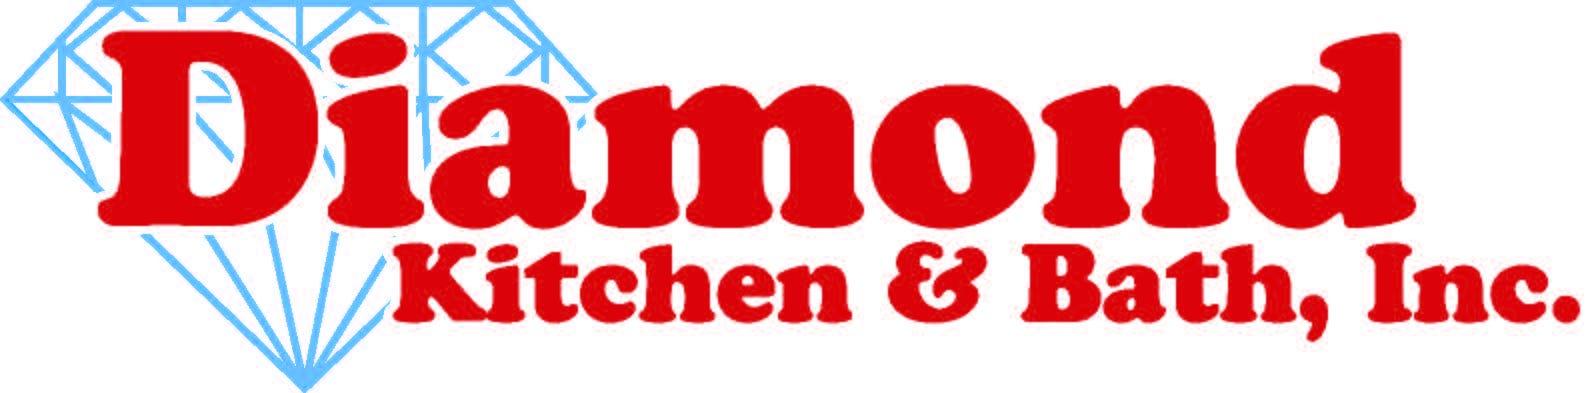 Diamond Kitchen & Bath Logo